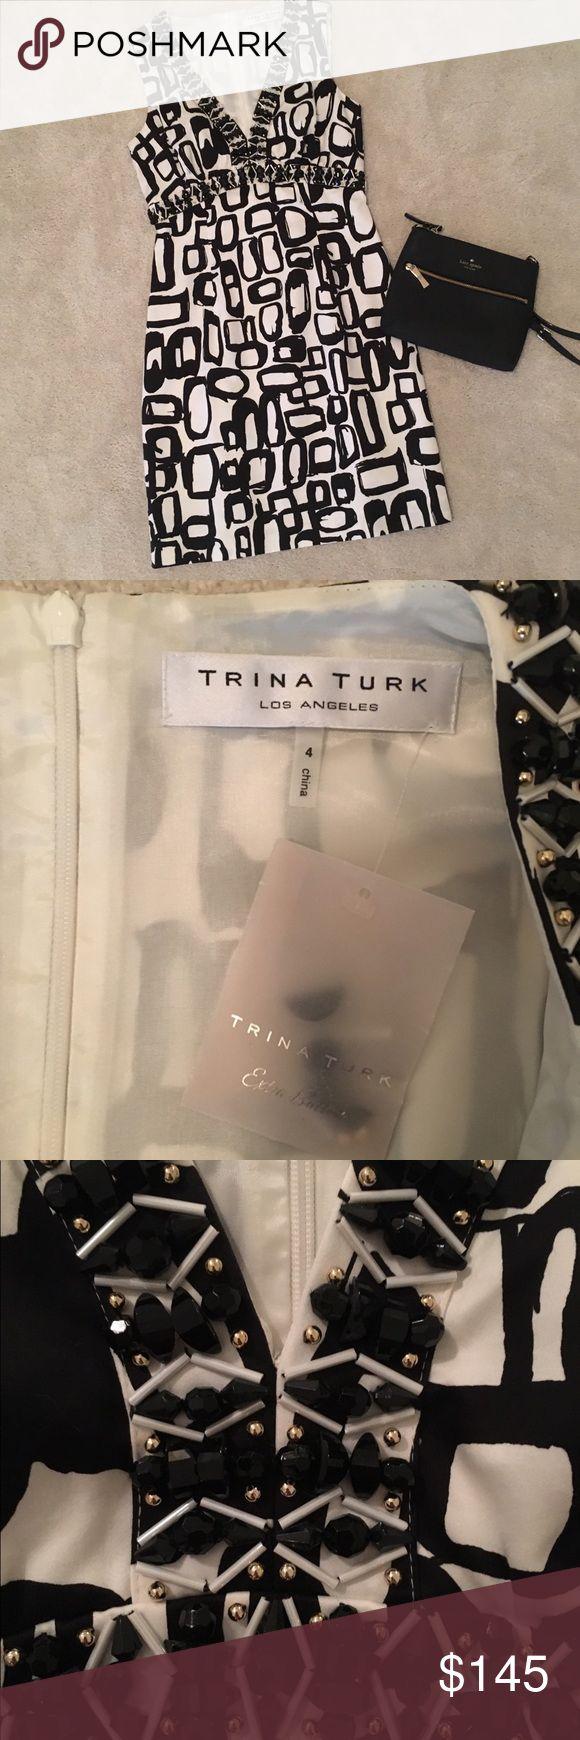 NWT Trina Turk geometric print dress size 4 NWT Trina Turk geometric print dress size 4. V-neck for a flattering shape with a zipper up the back. Beautiful beading on the neck line. 75% cotton, 25% silk lining Trina Turk Dresses Midi